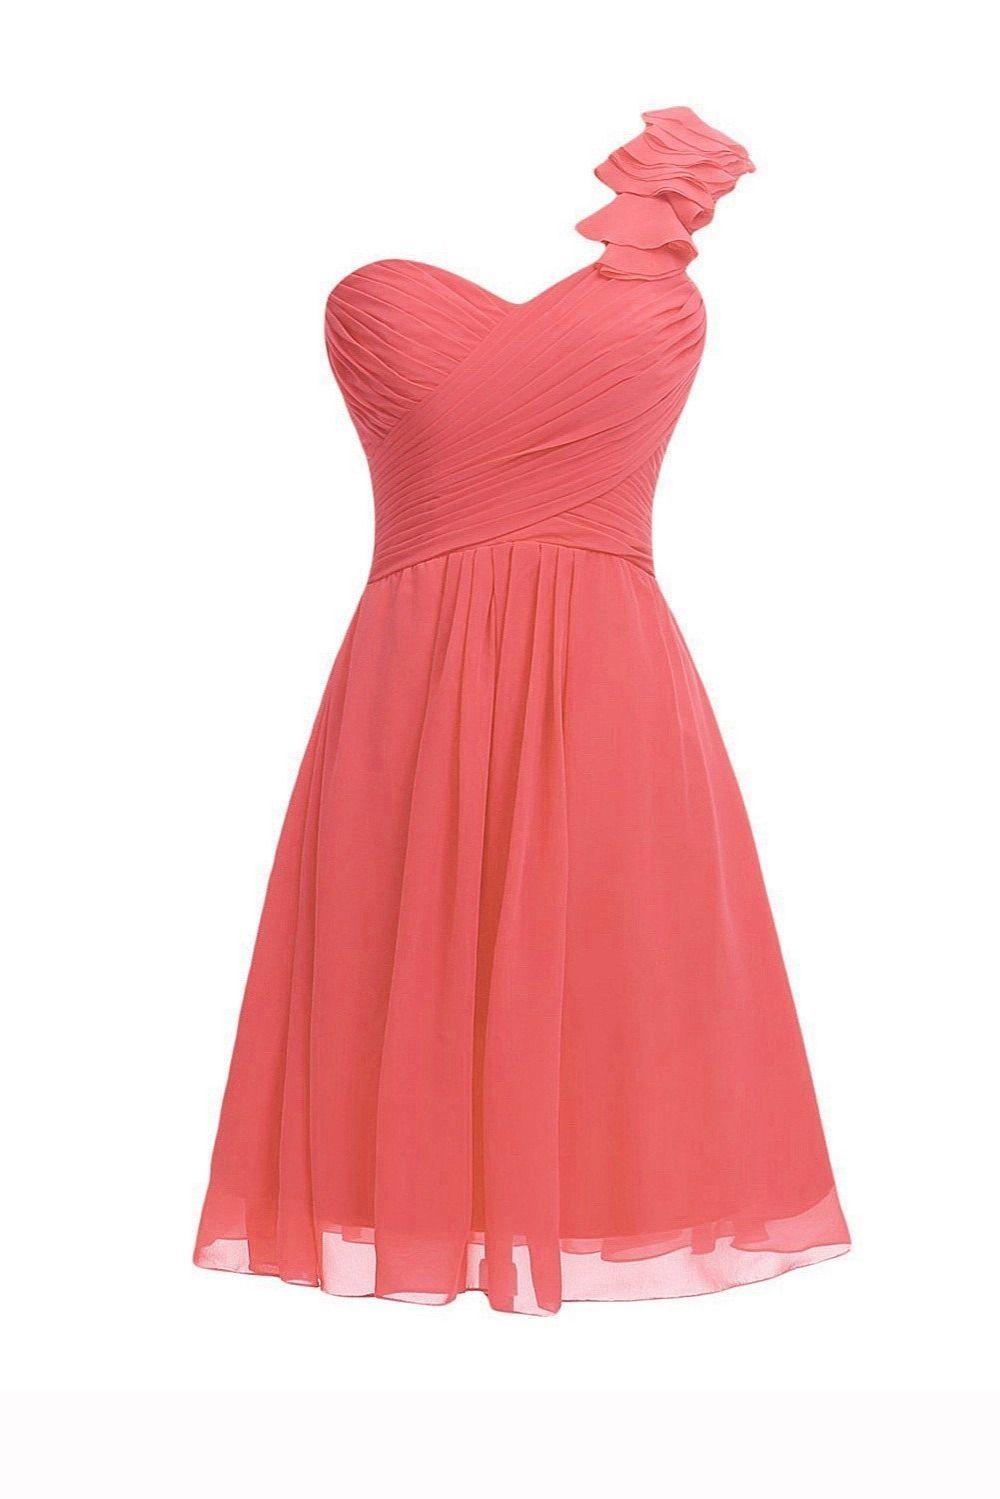 Bg646 Charming Prom Dress,Short Prom Dresses,One Shoulder Prom ...